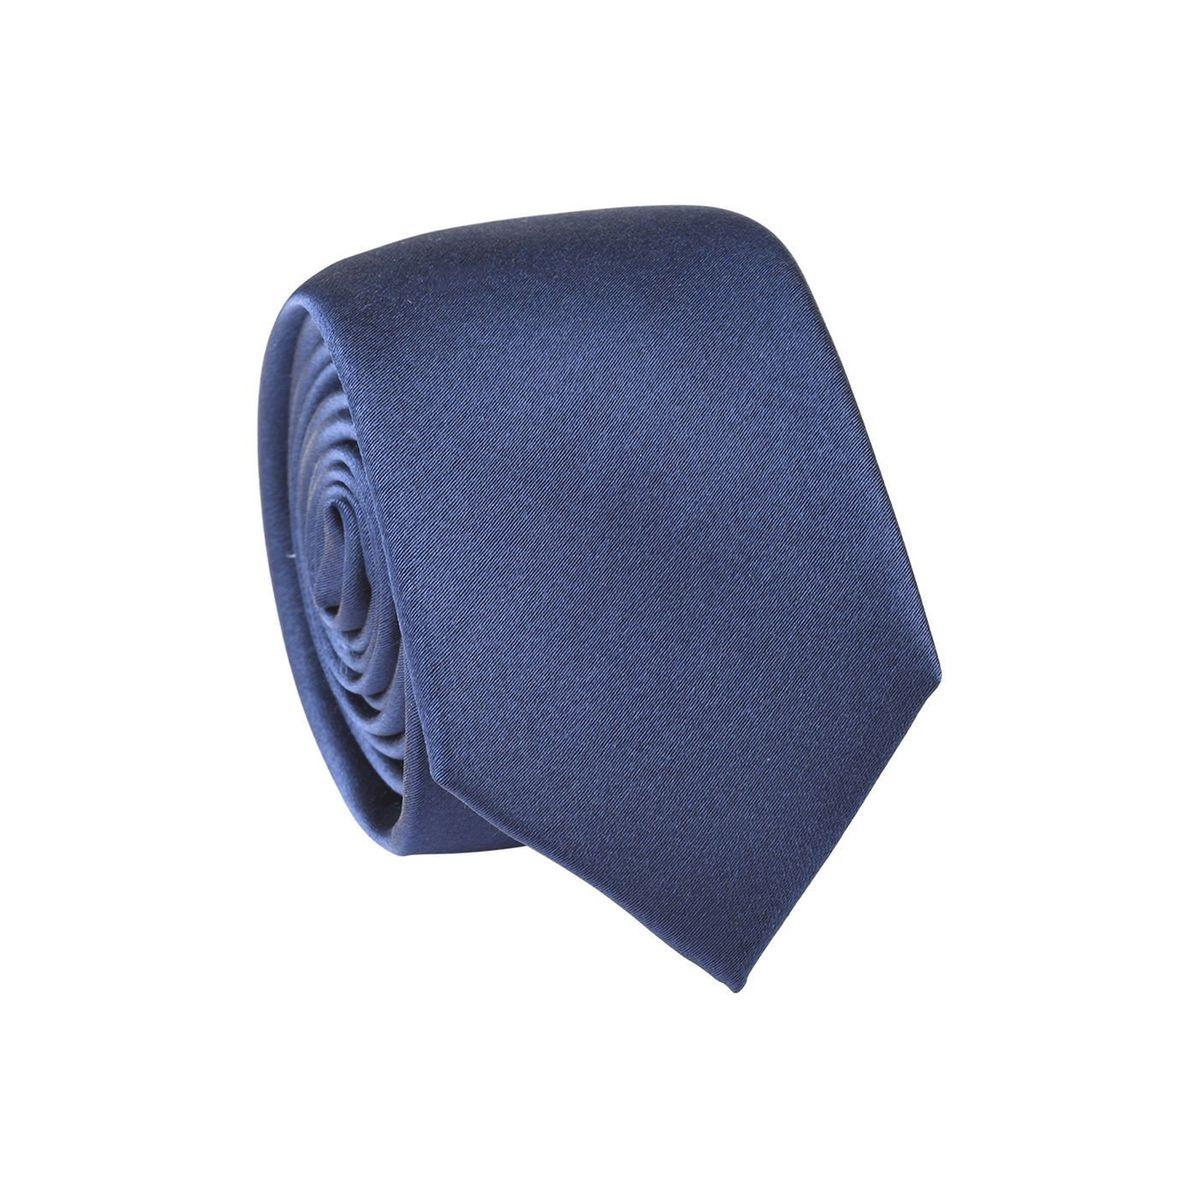 Cravate homme unie satin Bleu marine